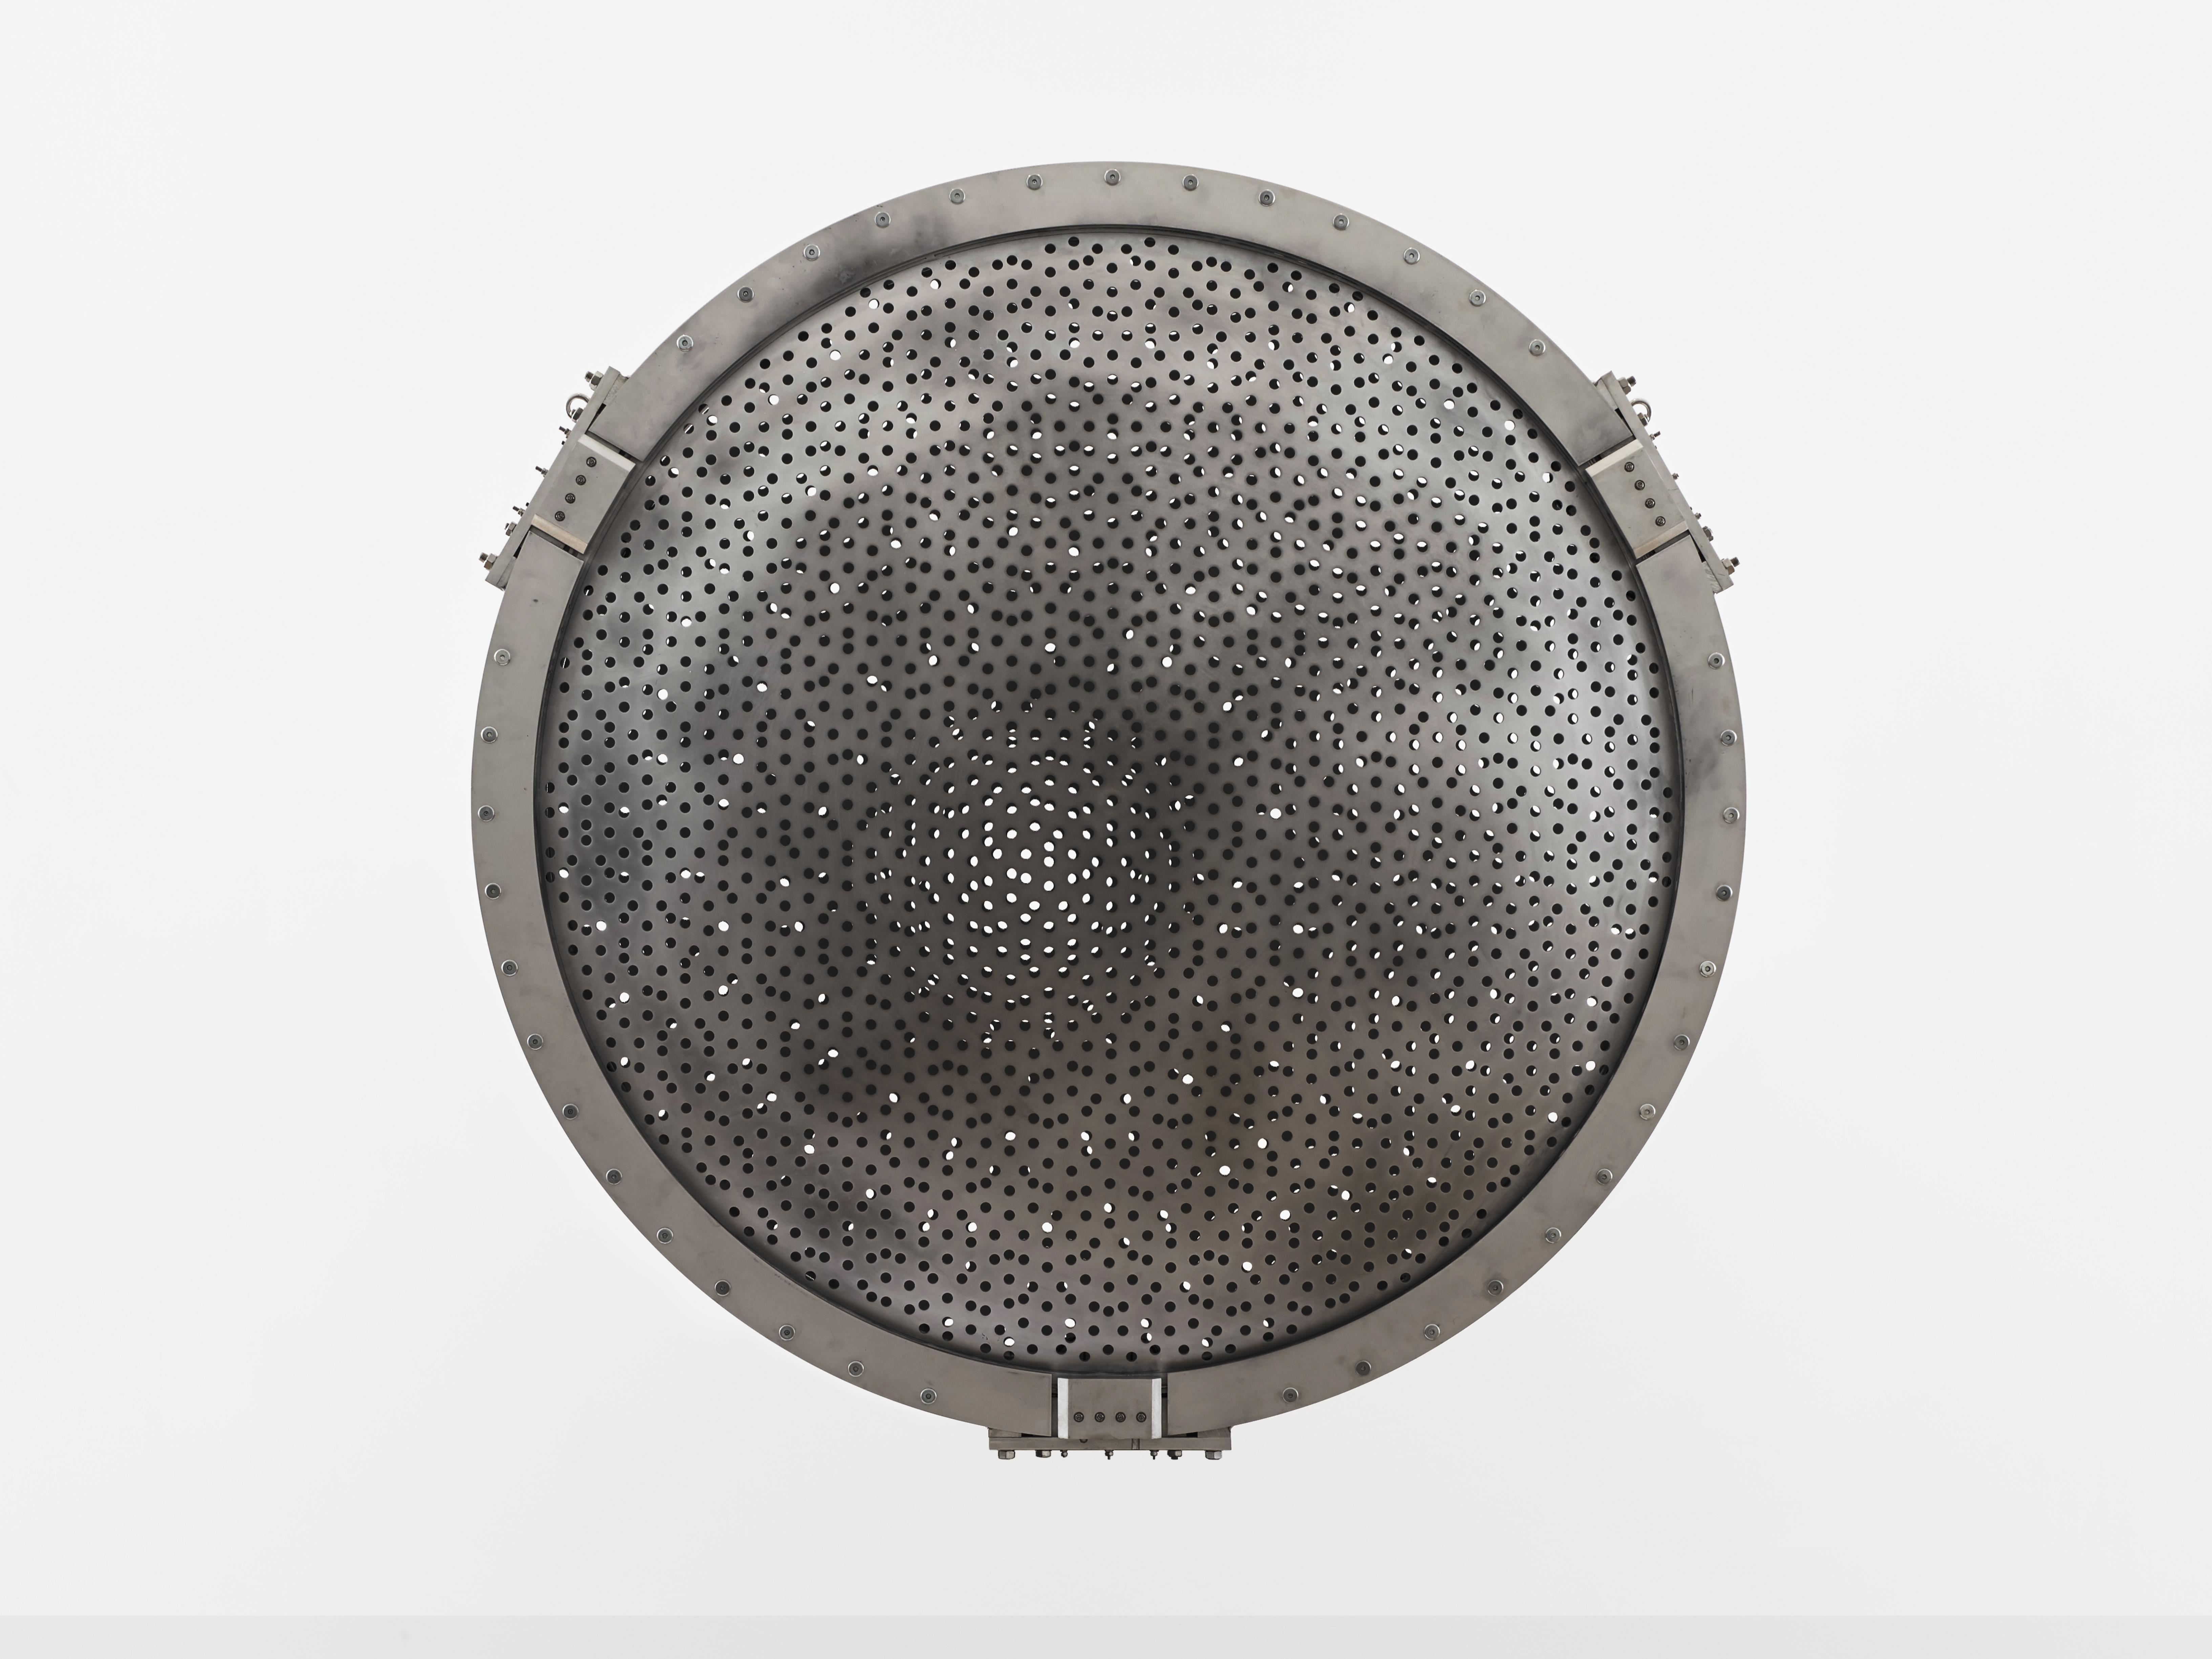 1, Conrad Shawcross Kinetic, Linear Burst